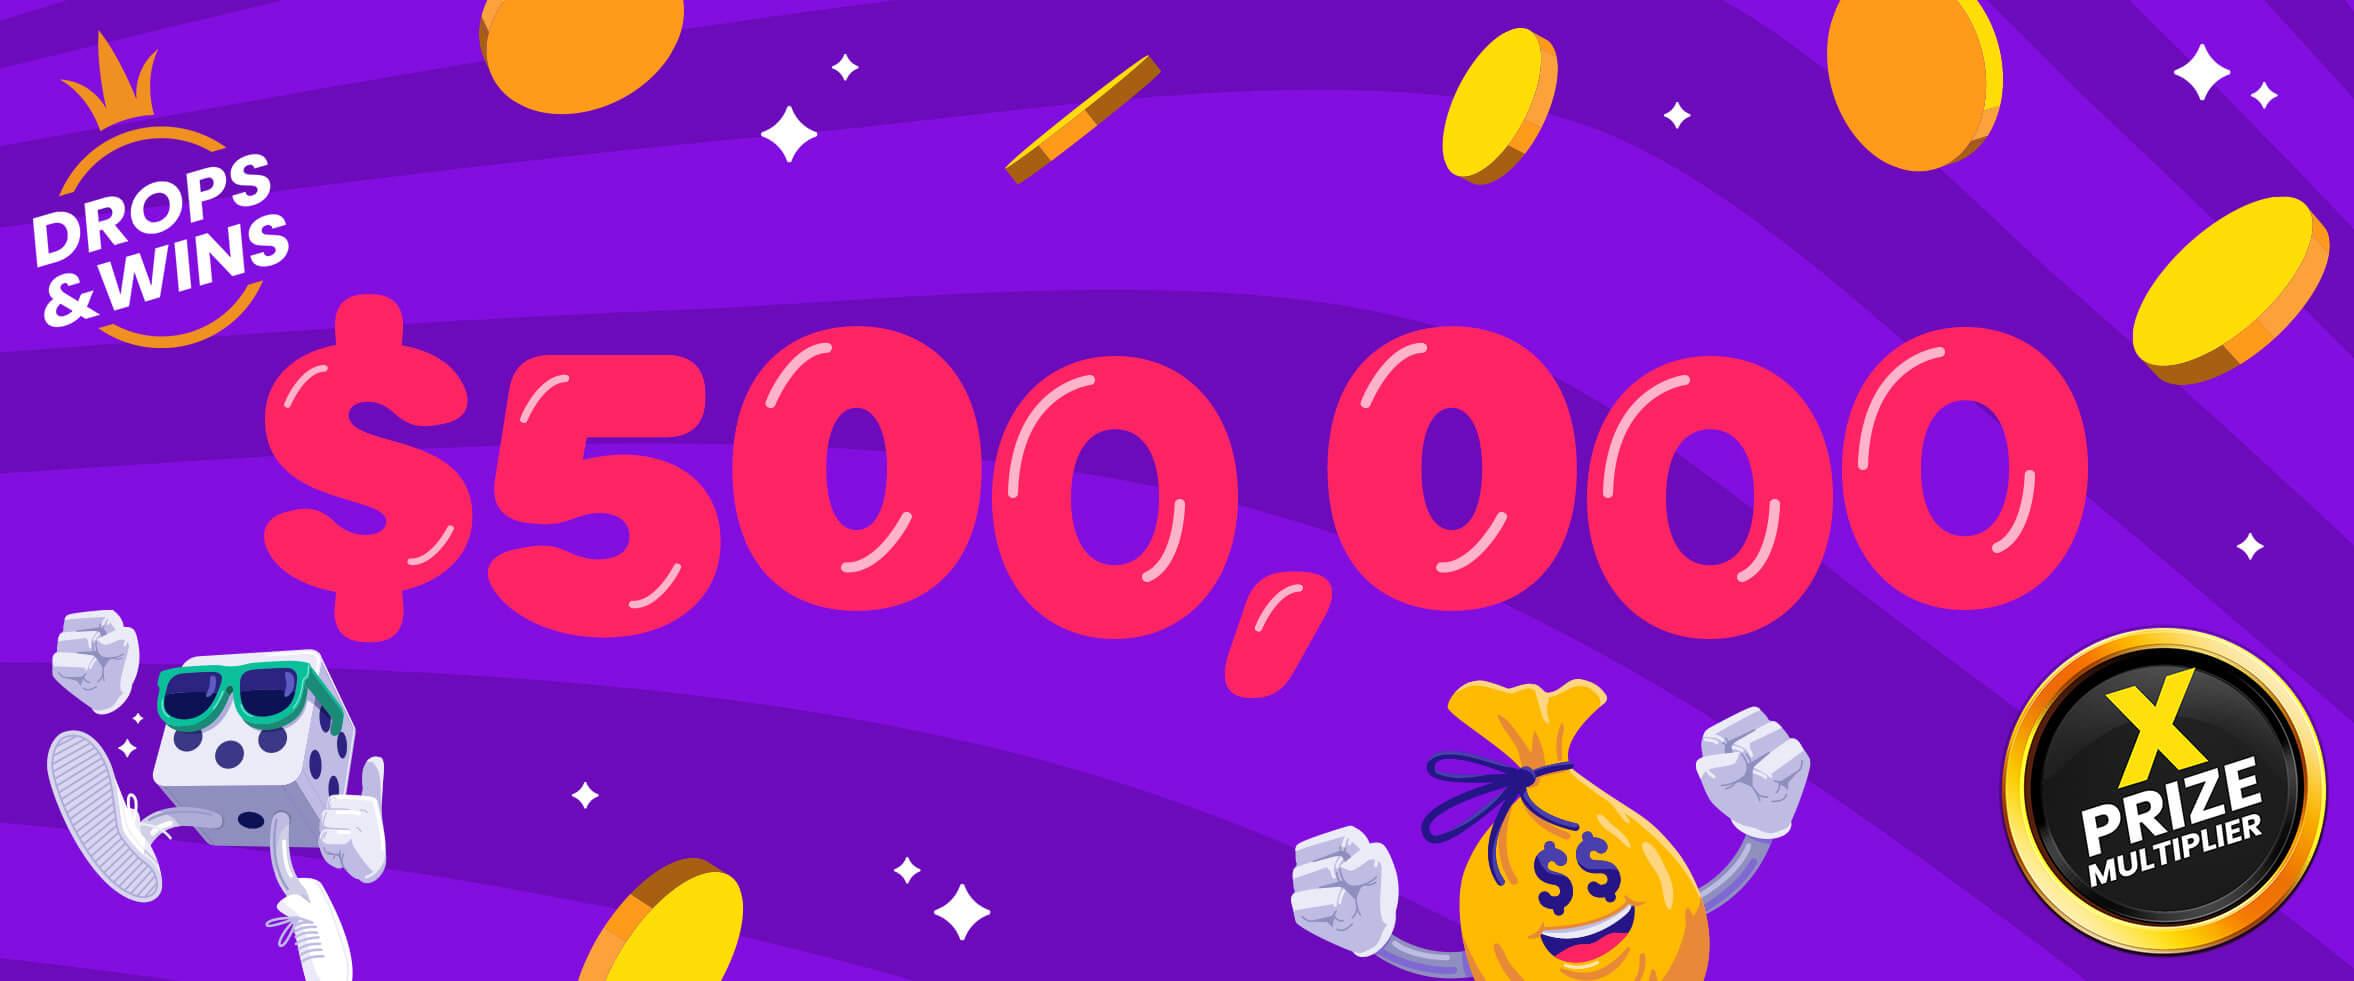 Pragmatic Play augmente les prix de Drops & Wins à 7 000 000 $